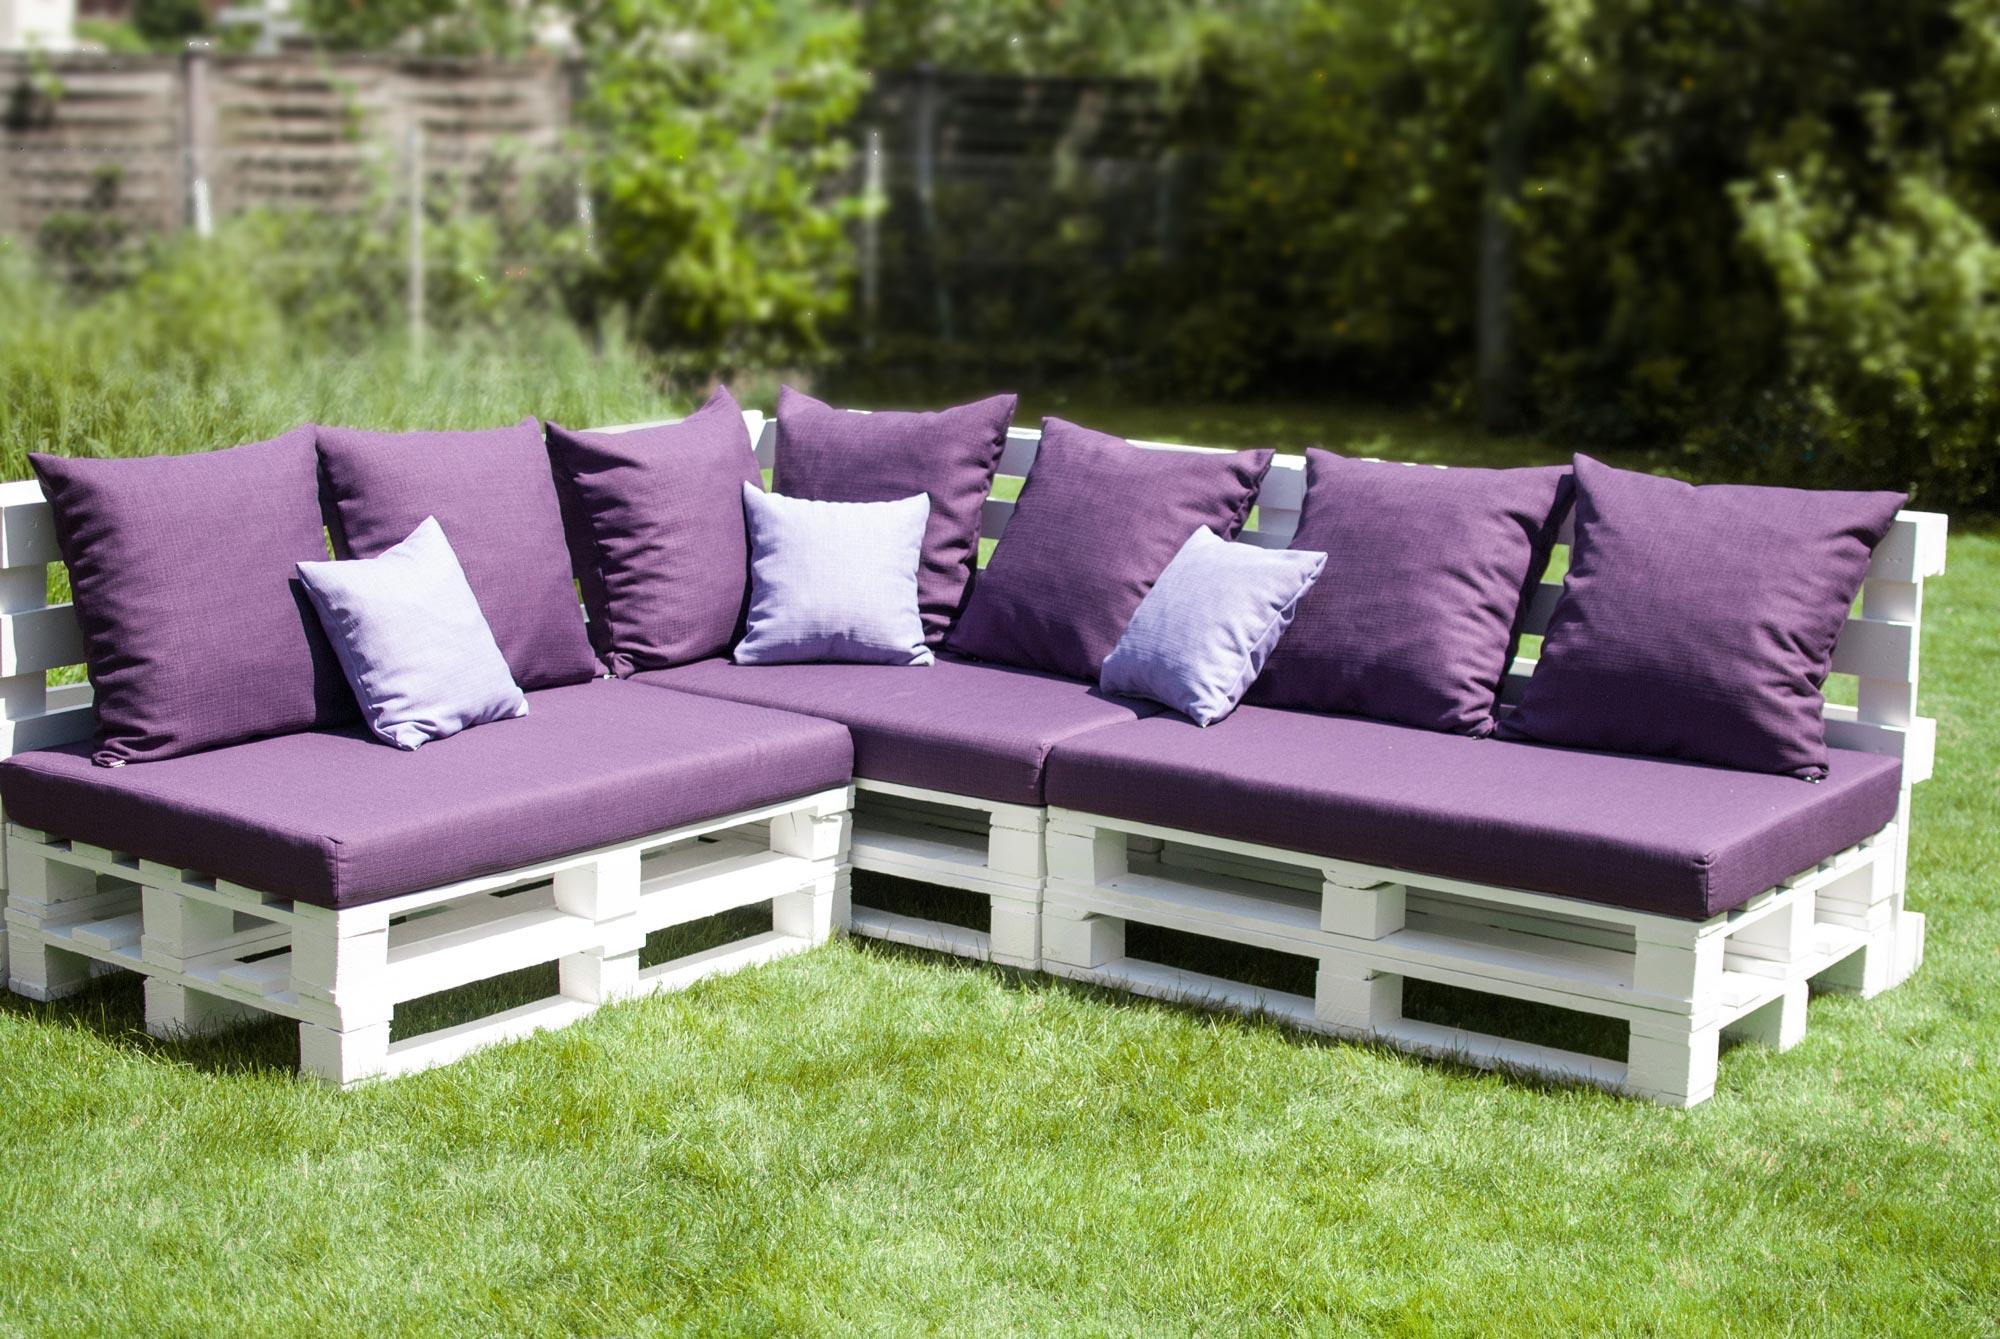 Garden furniture from pallets (8 photos): ideas for summer